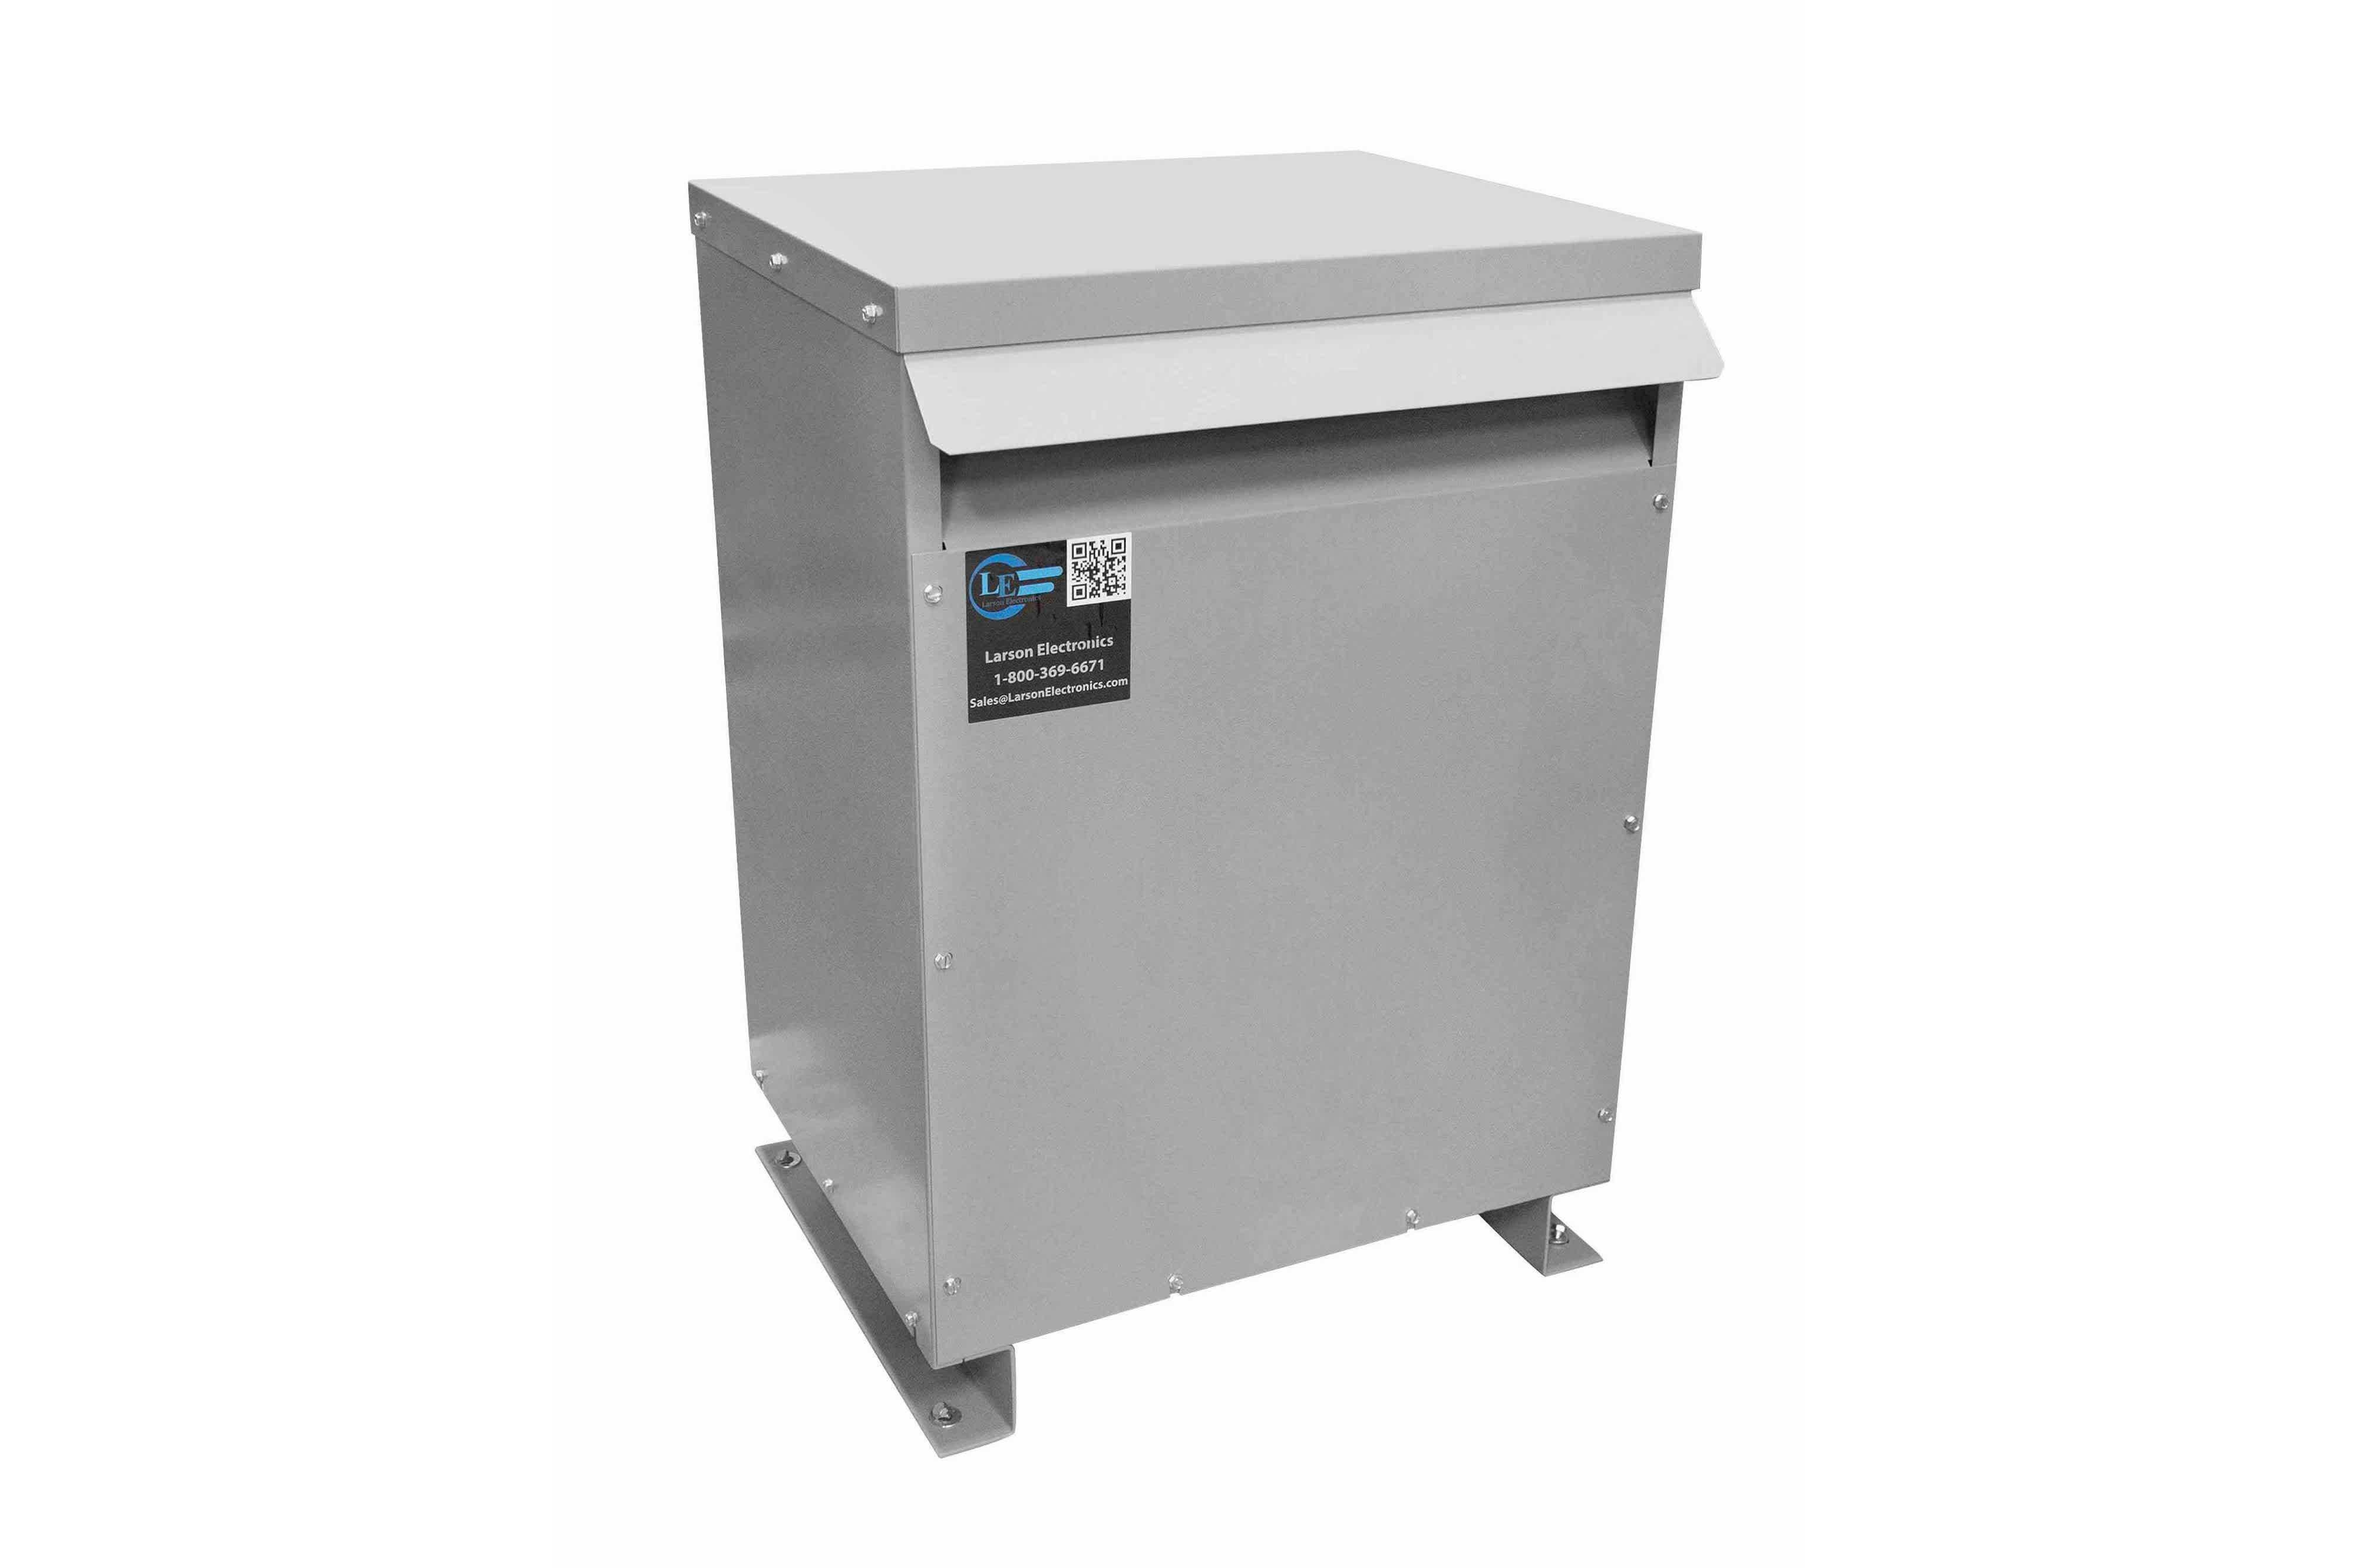 47.5 kVA 3PH Isolation Transformer, 440V Wye Primary, 208Y/120 Wye-N Secondary, N3R, Ventilated, 60 Hz